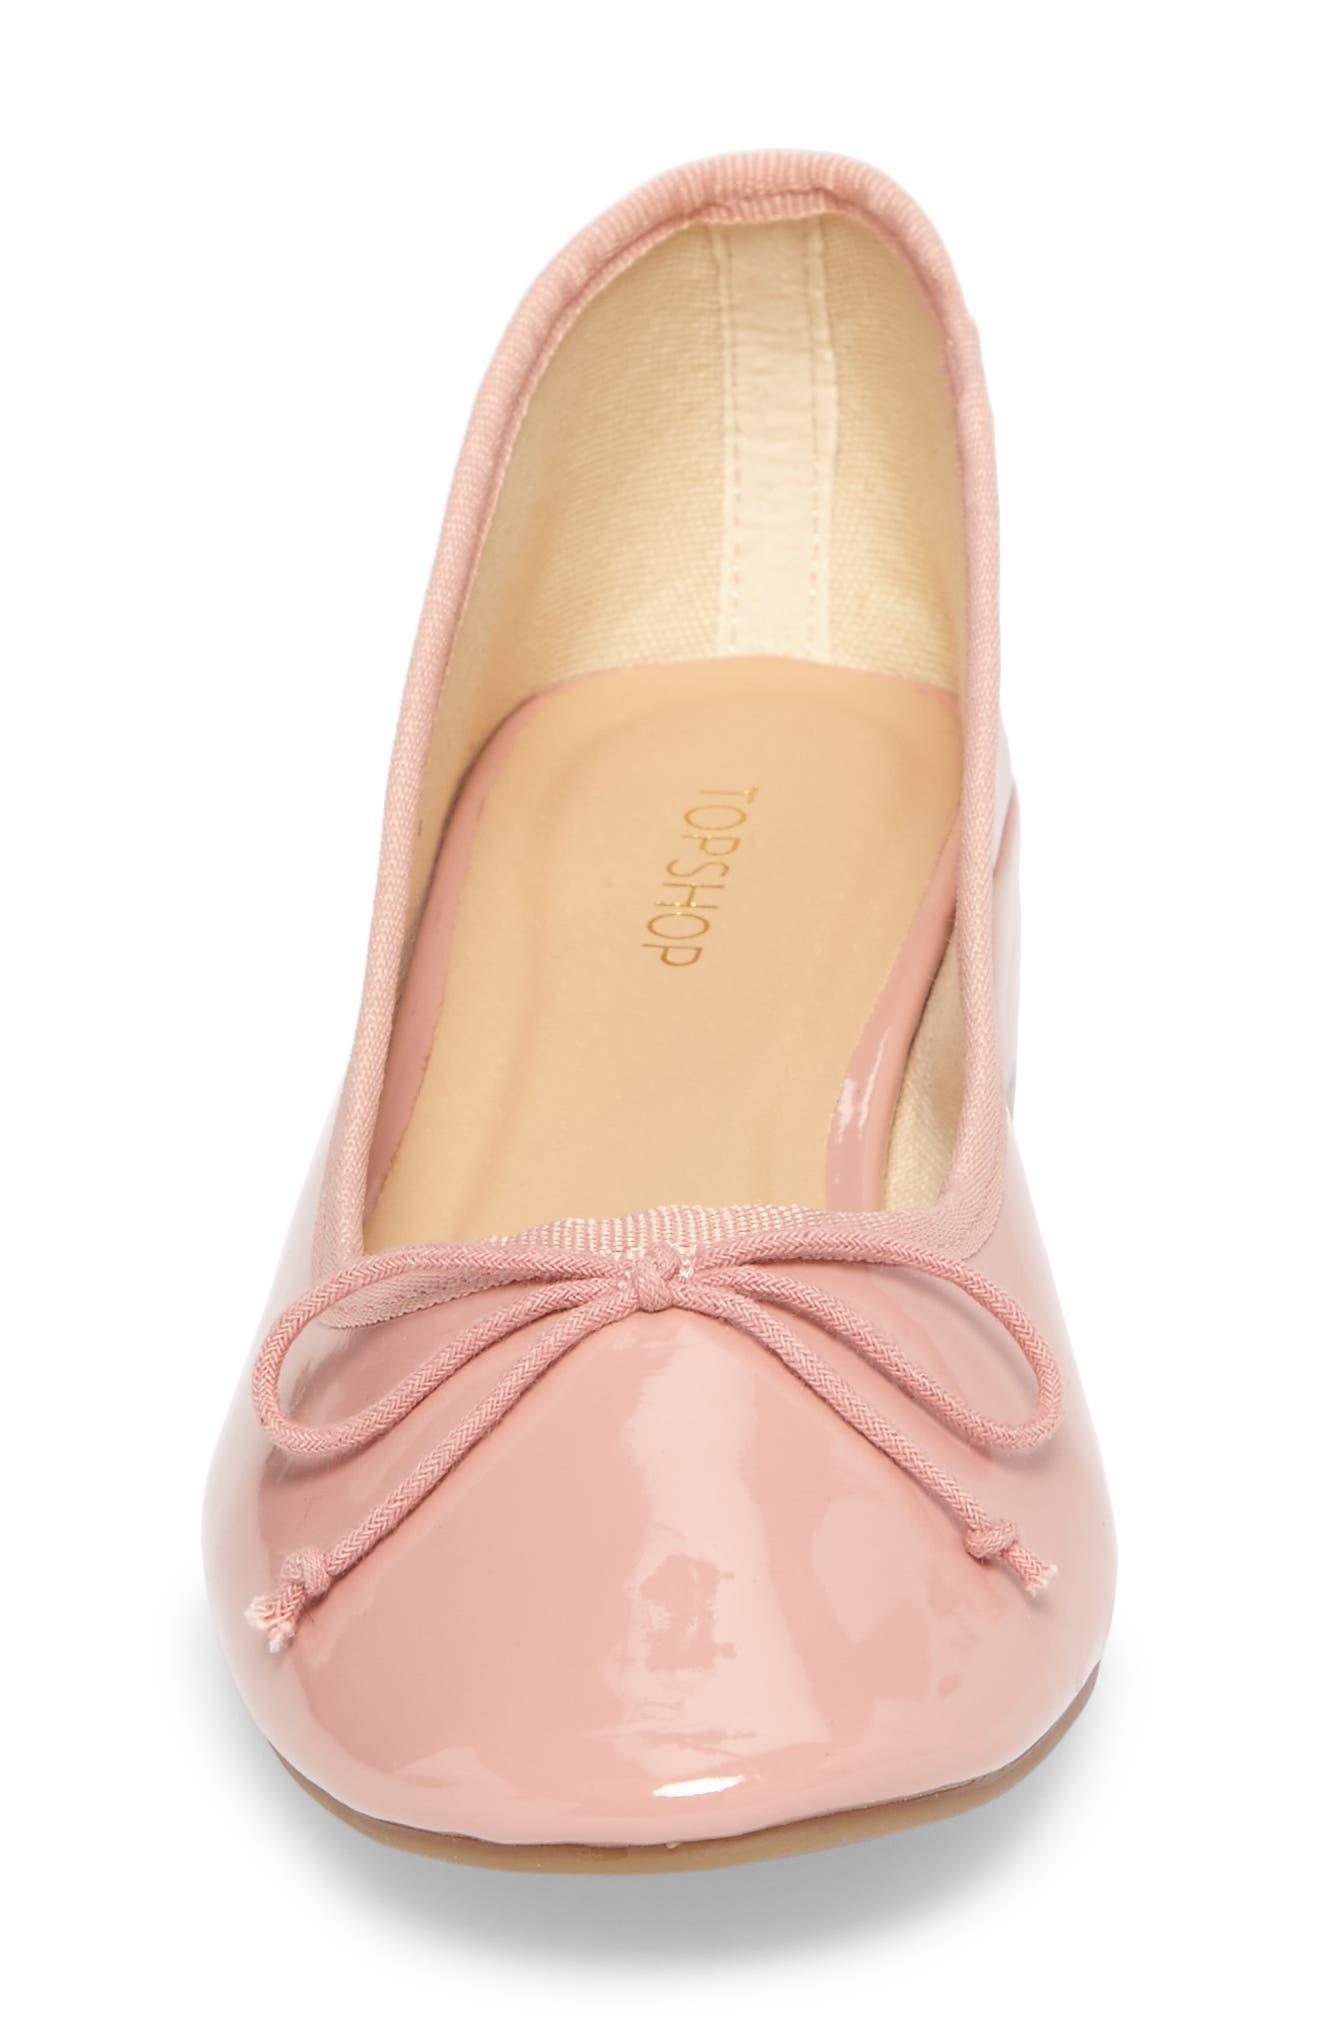 Glory Heeled Ballerina Slippers,                             Alternate thumbnail 5, color,                             650